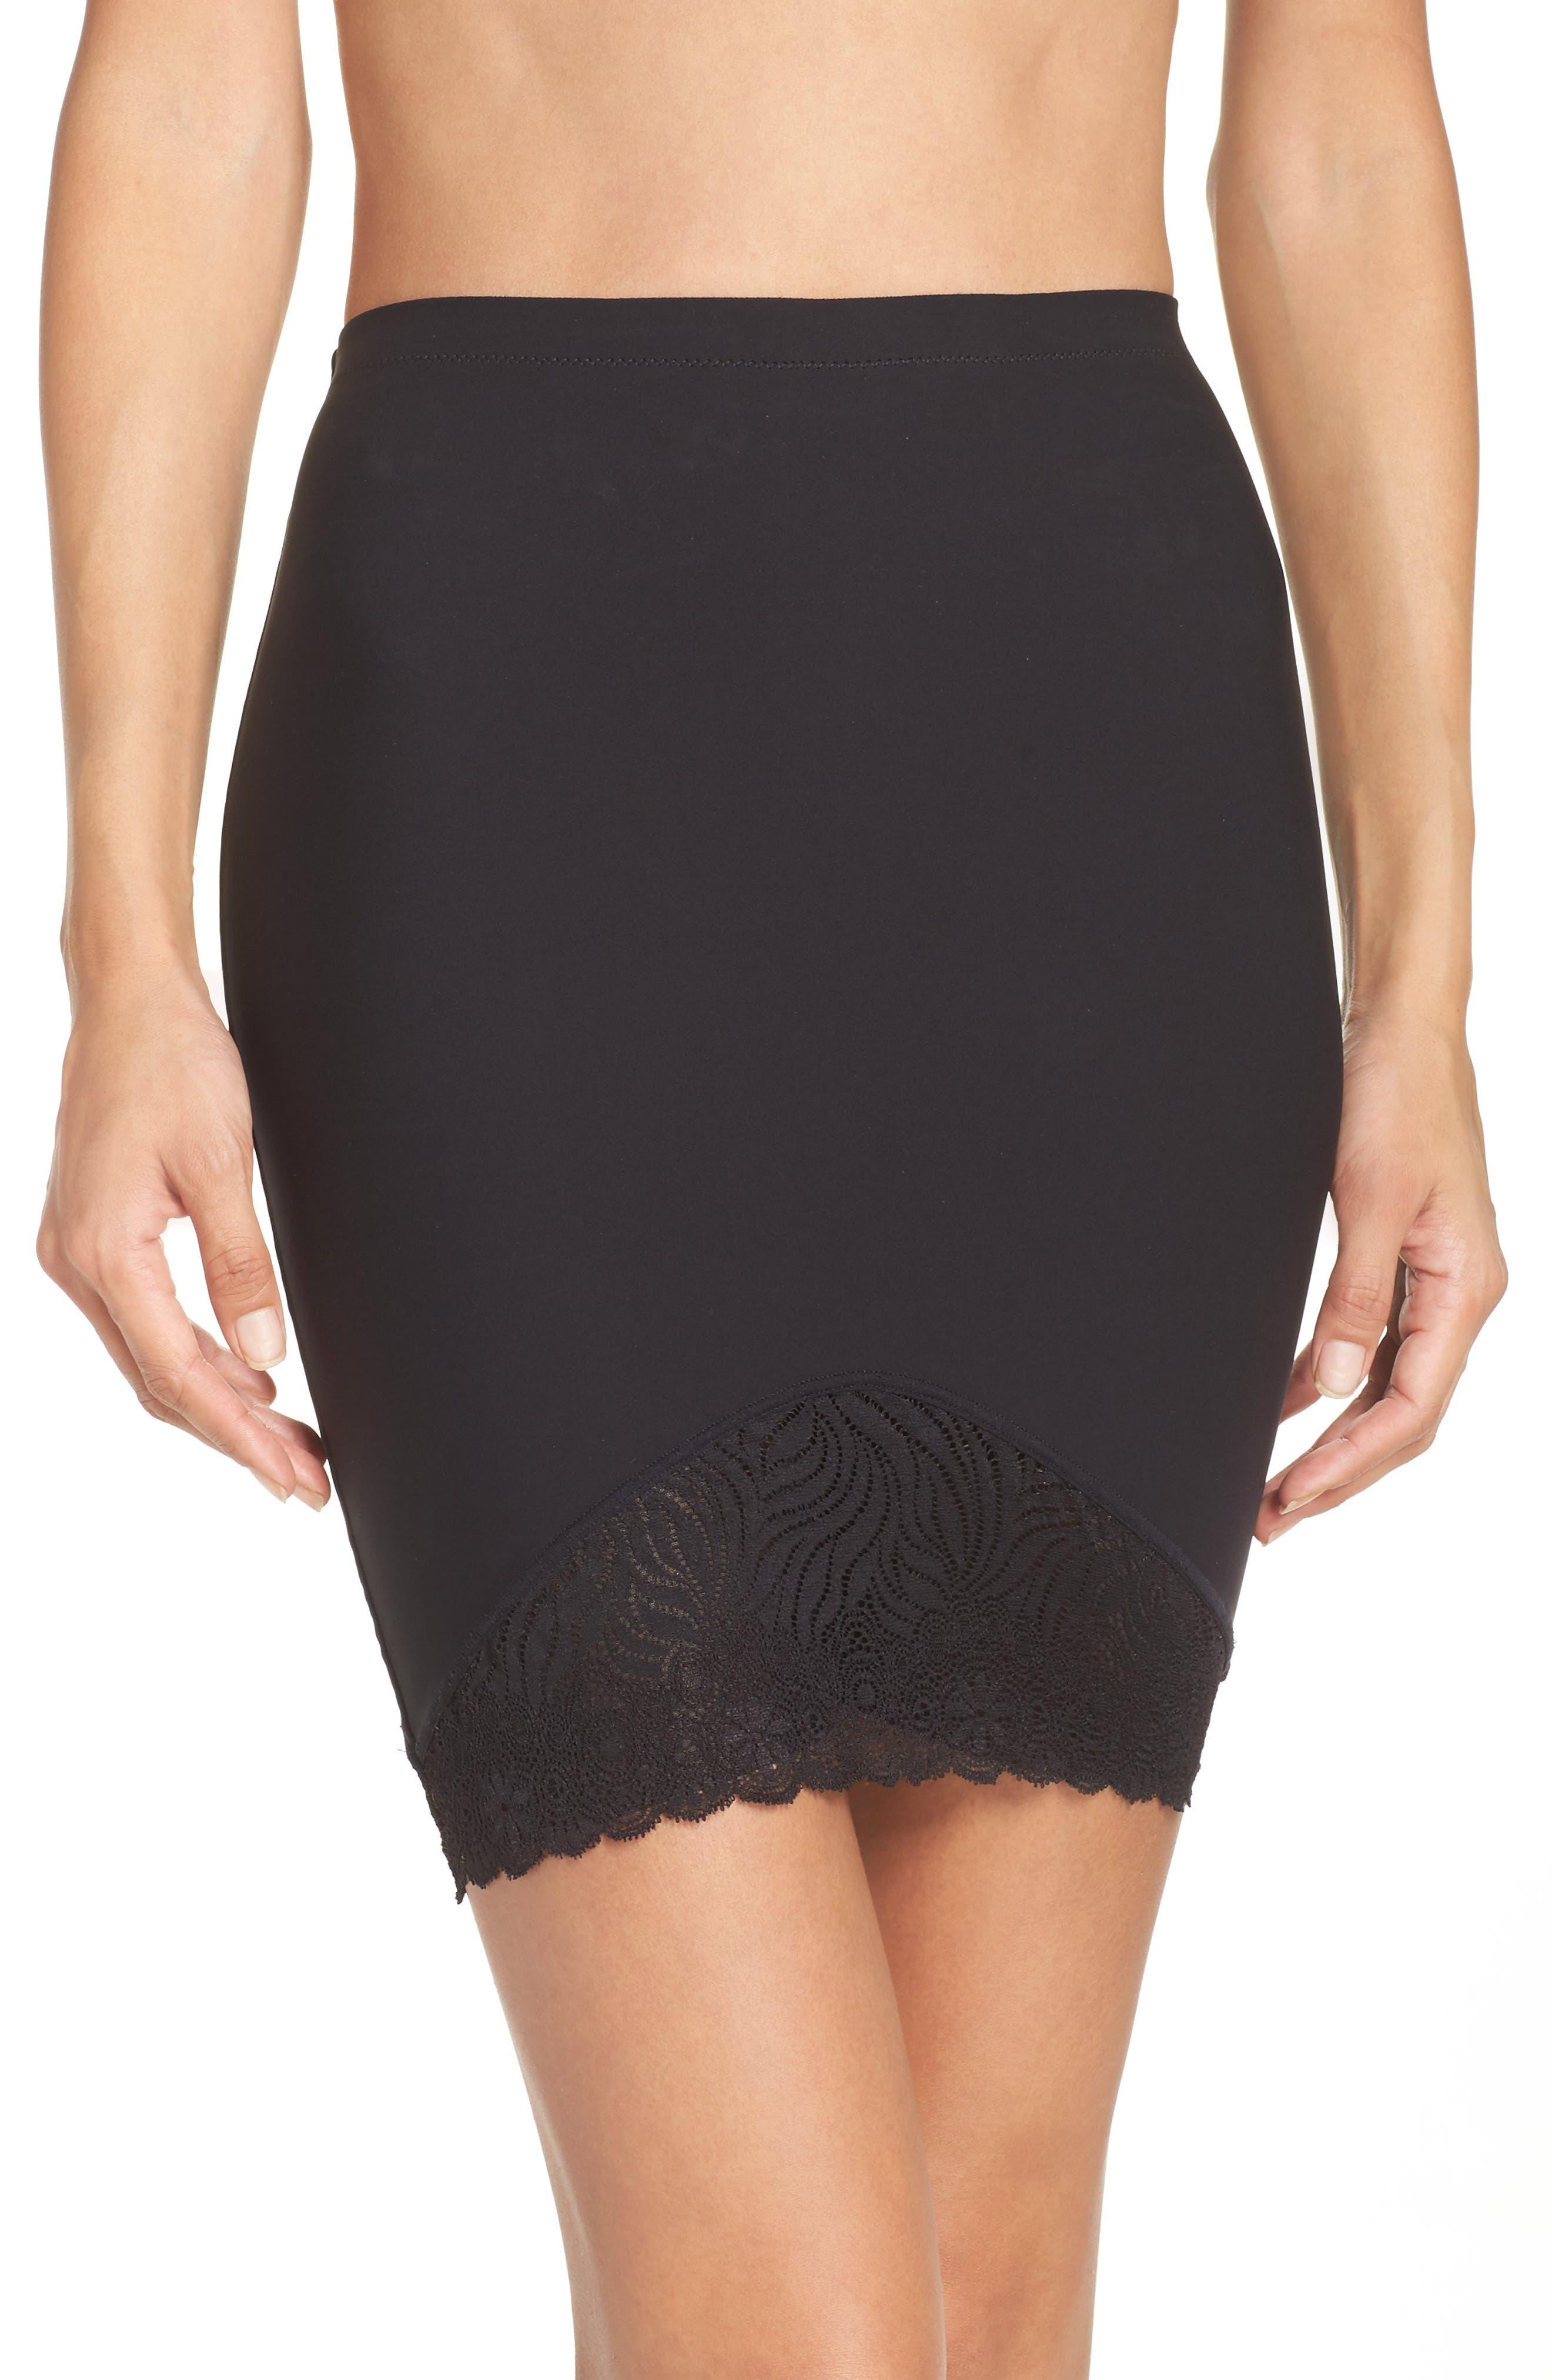 Top Model High Waist Skirt Shaper,                             Main thumbnail 1, color,                             001